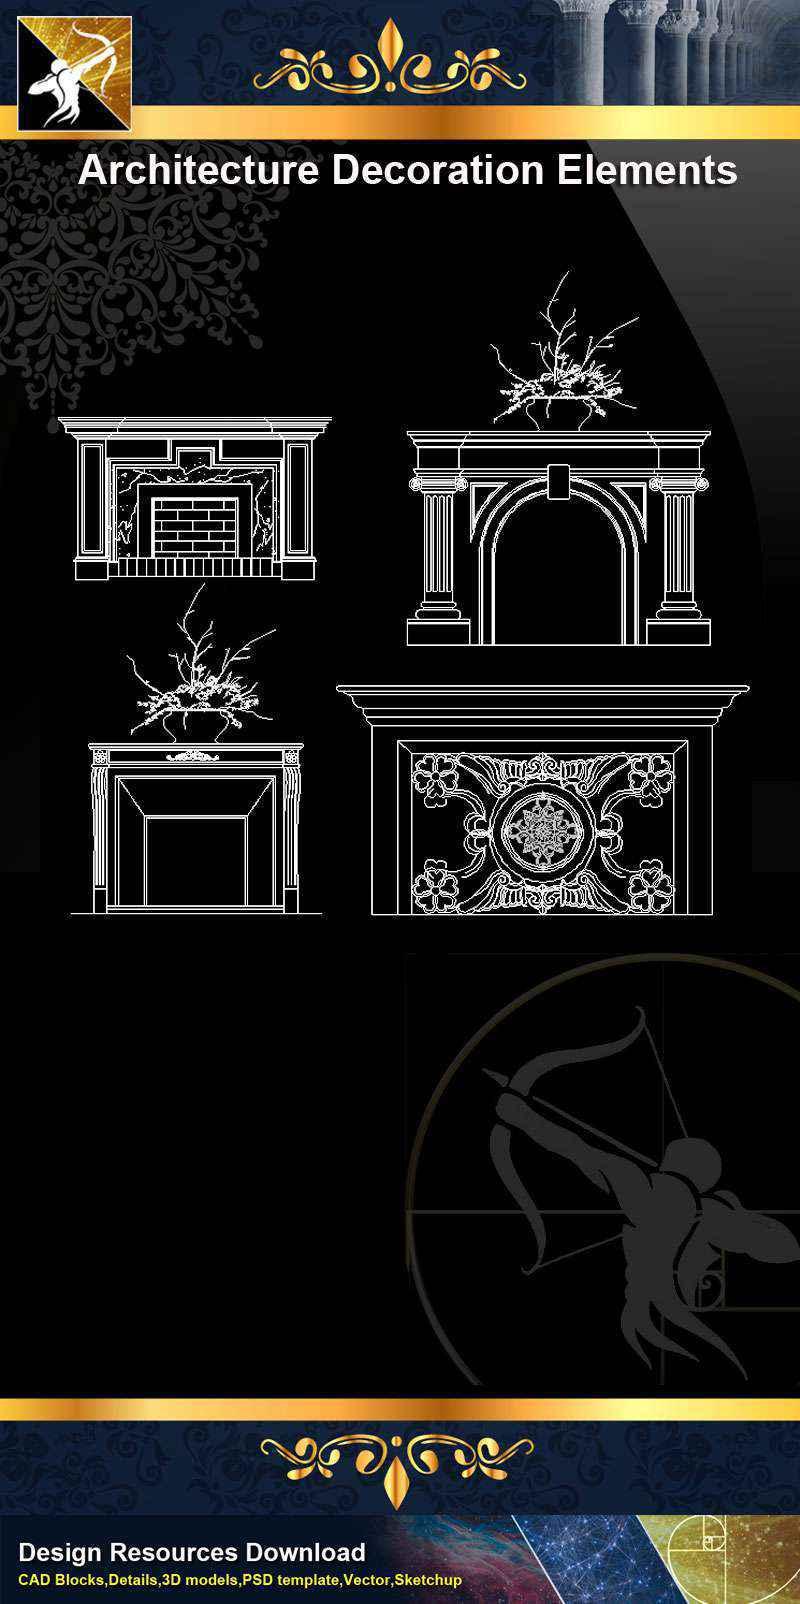 ★【 Free Architecture Decoration Elements V.10】@Autocad Decoration Blocks,Drawings,CAD Details,Elevation